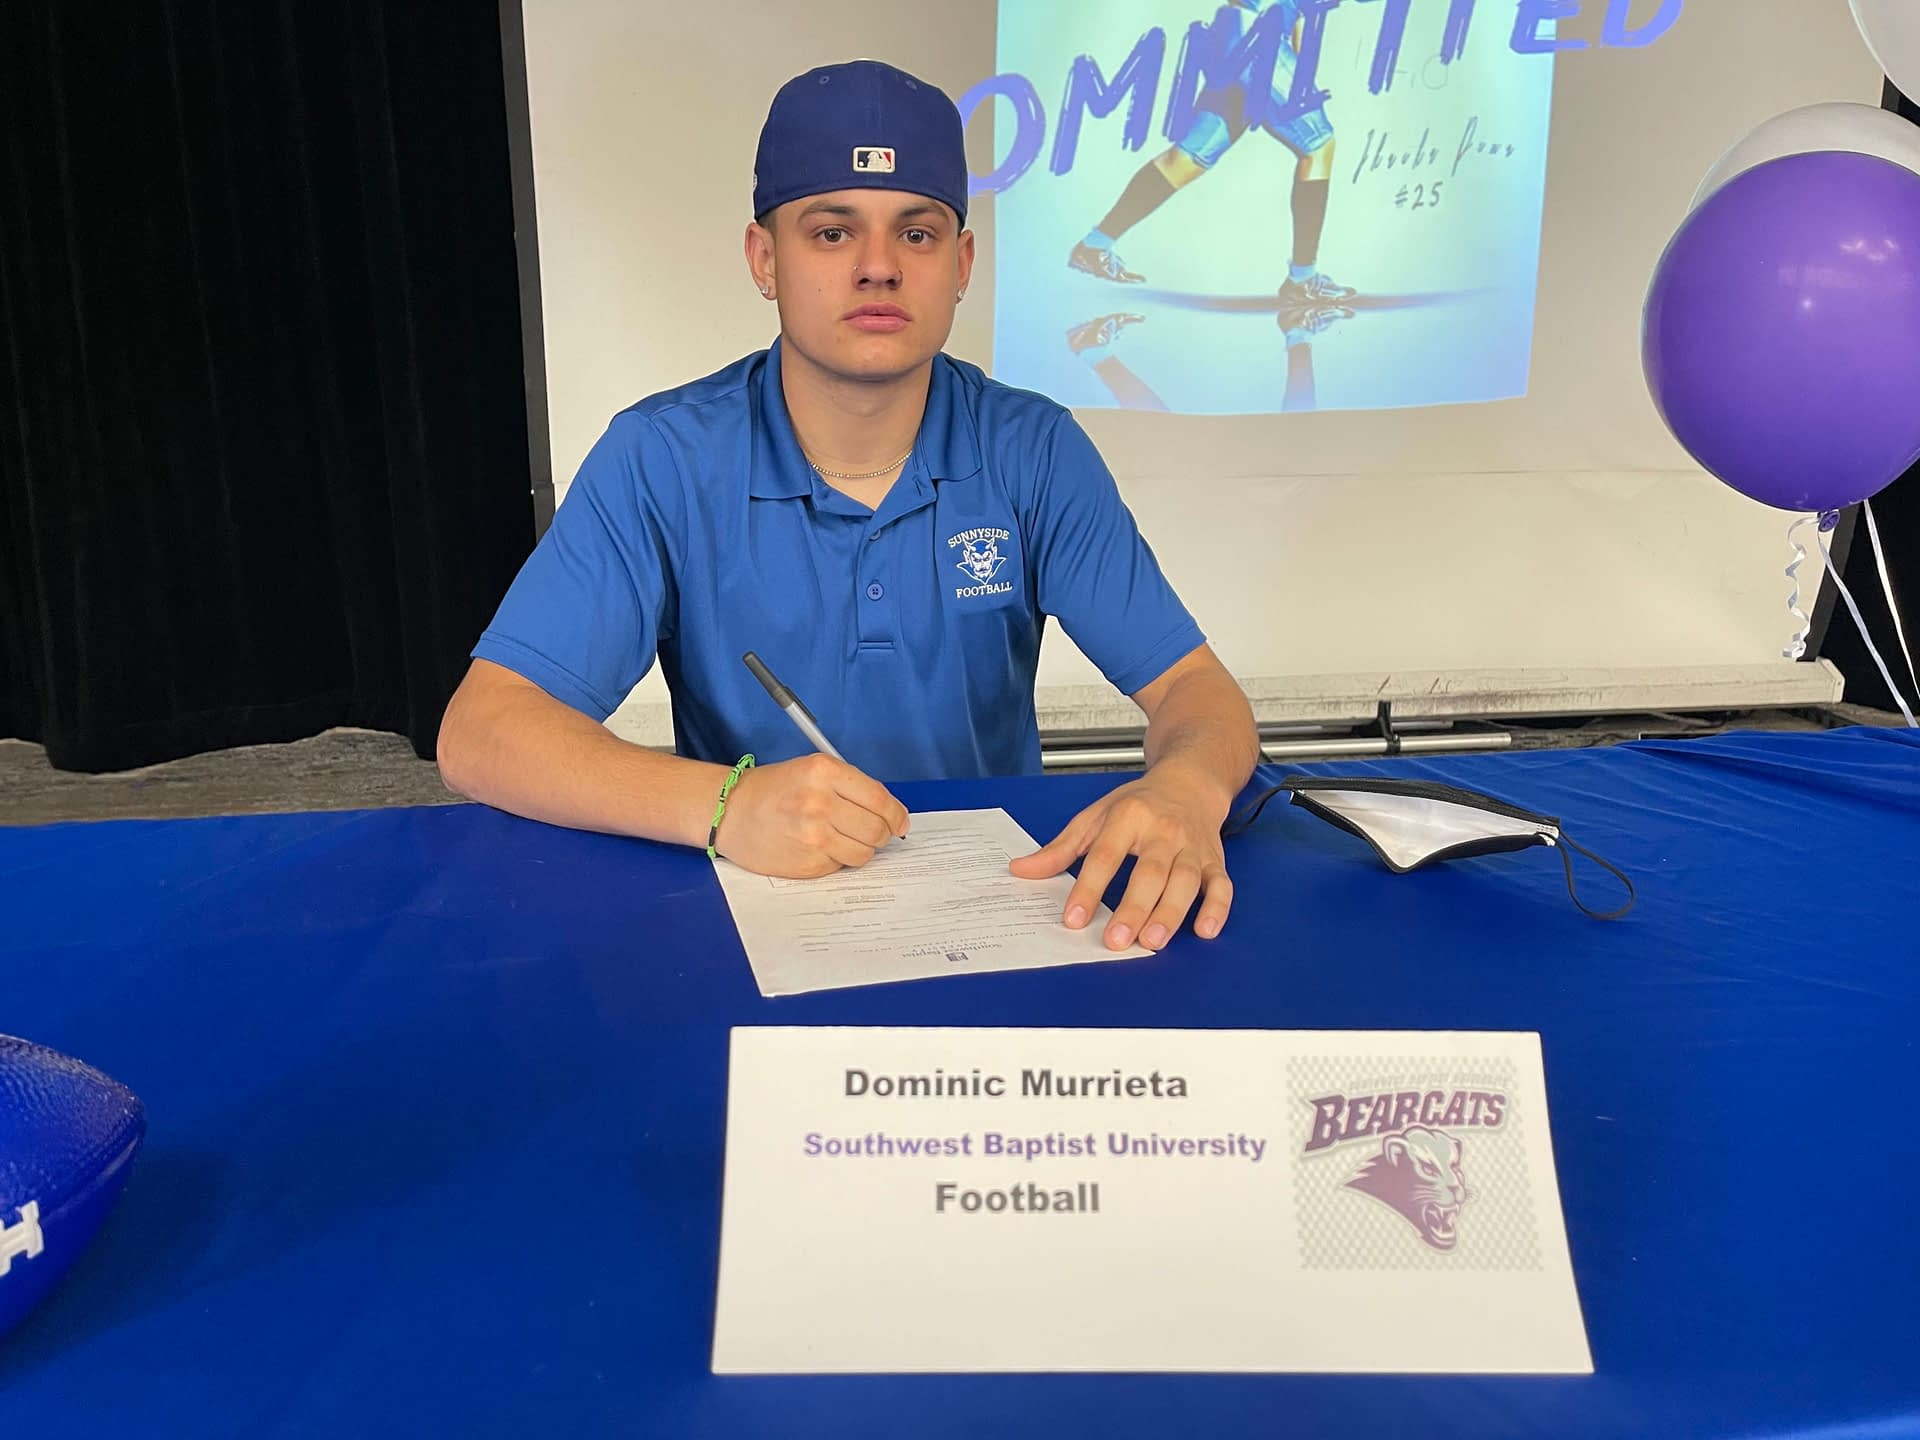 DominicMurrieta